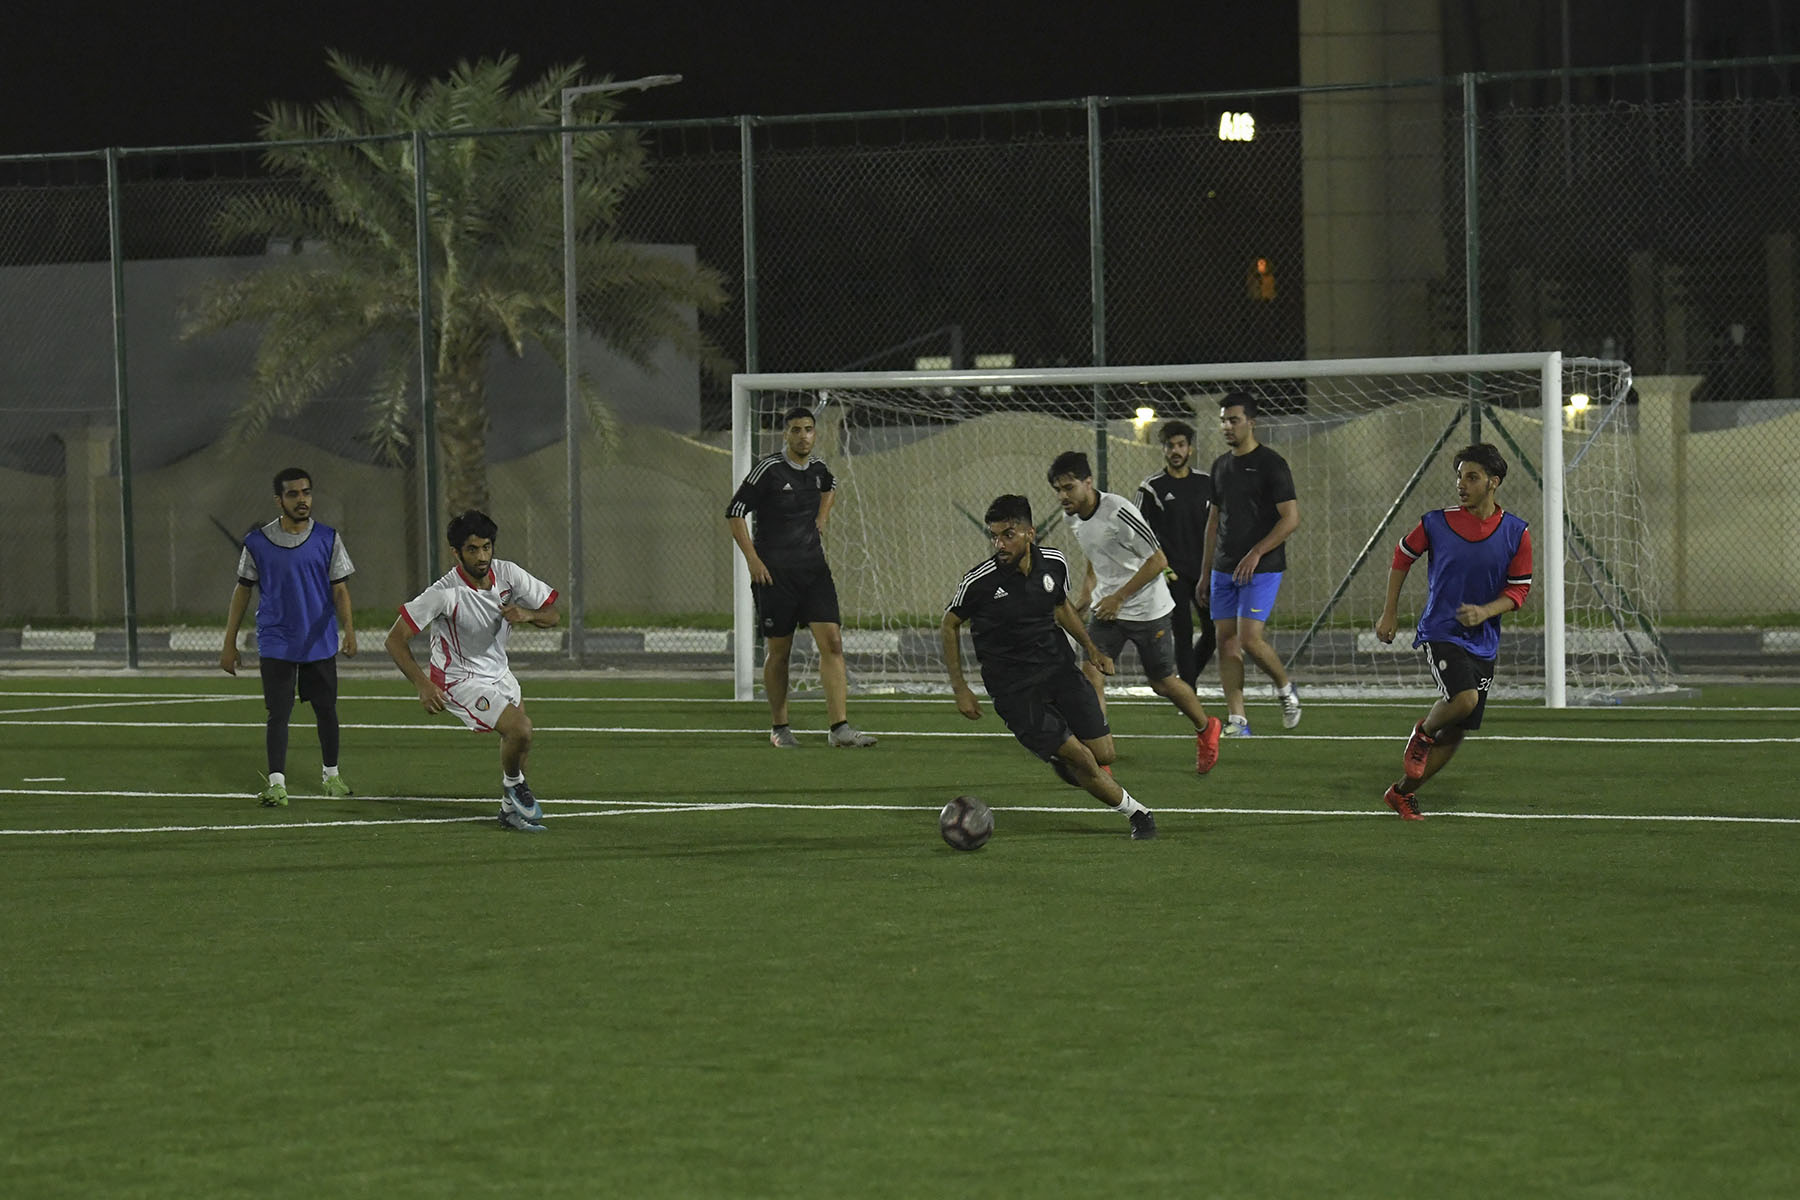 Real Madrid vs Law Students Semi Final Match